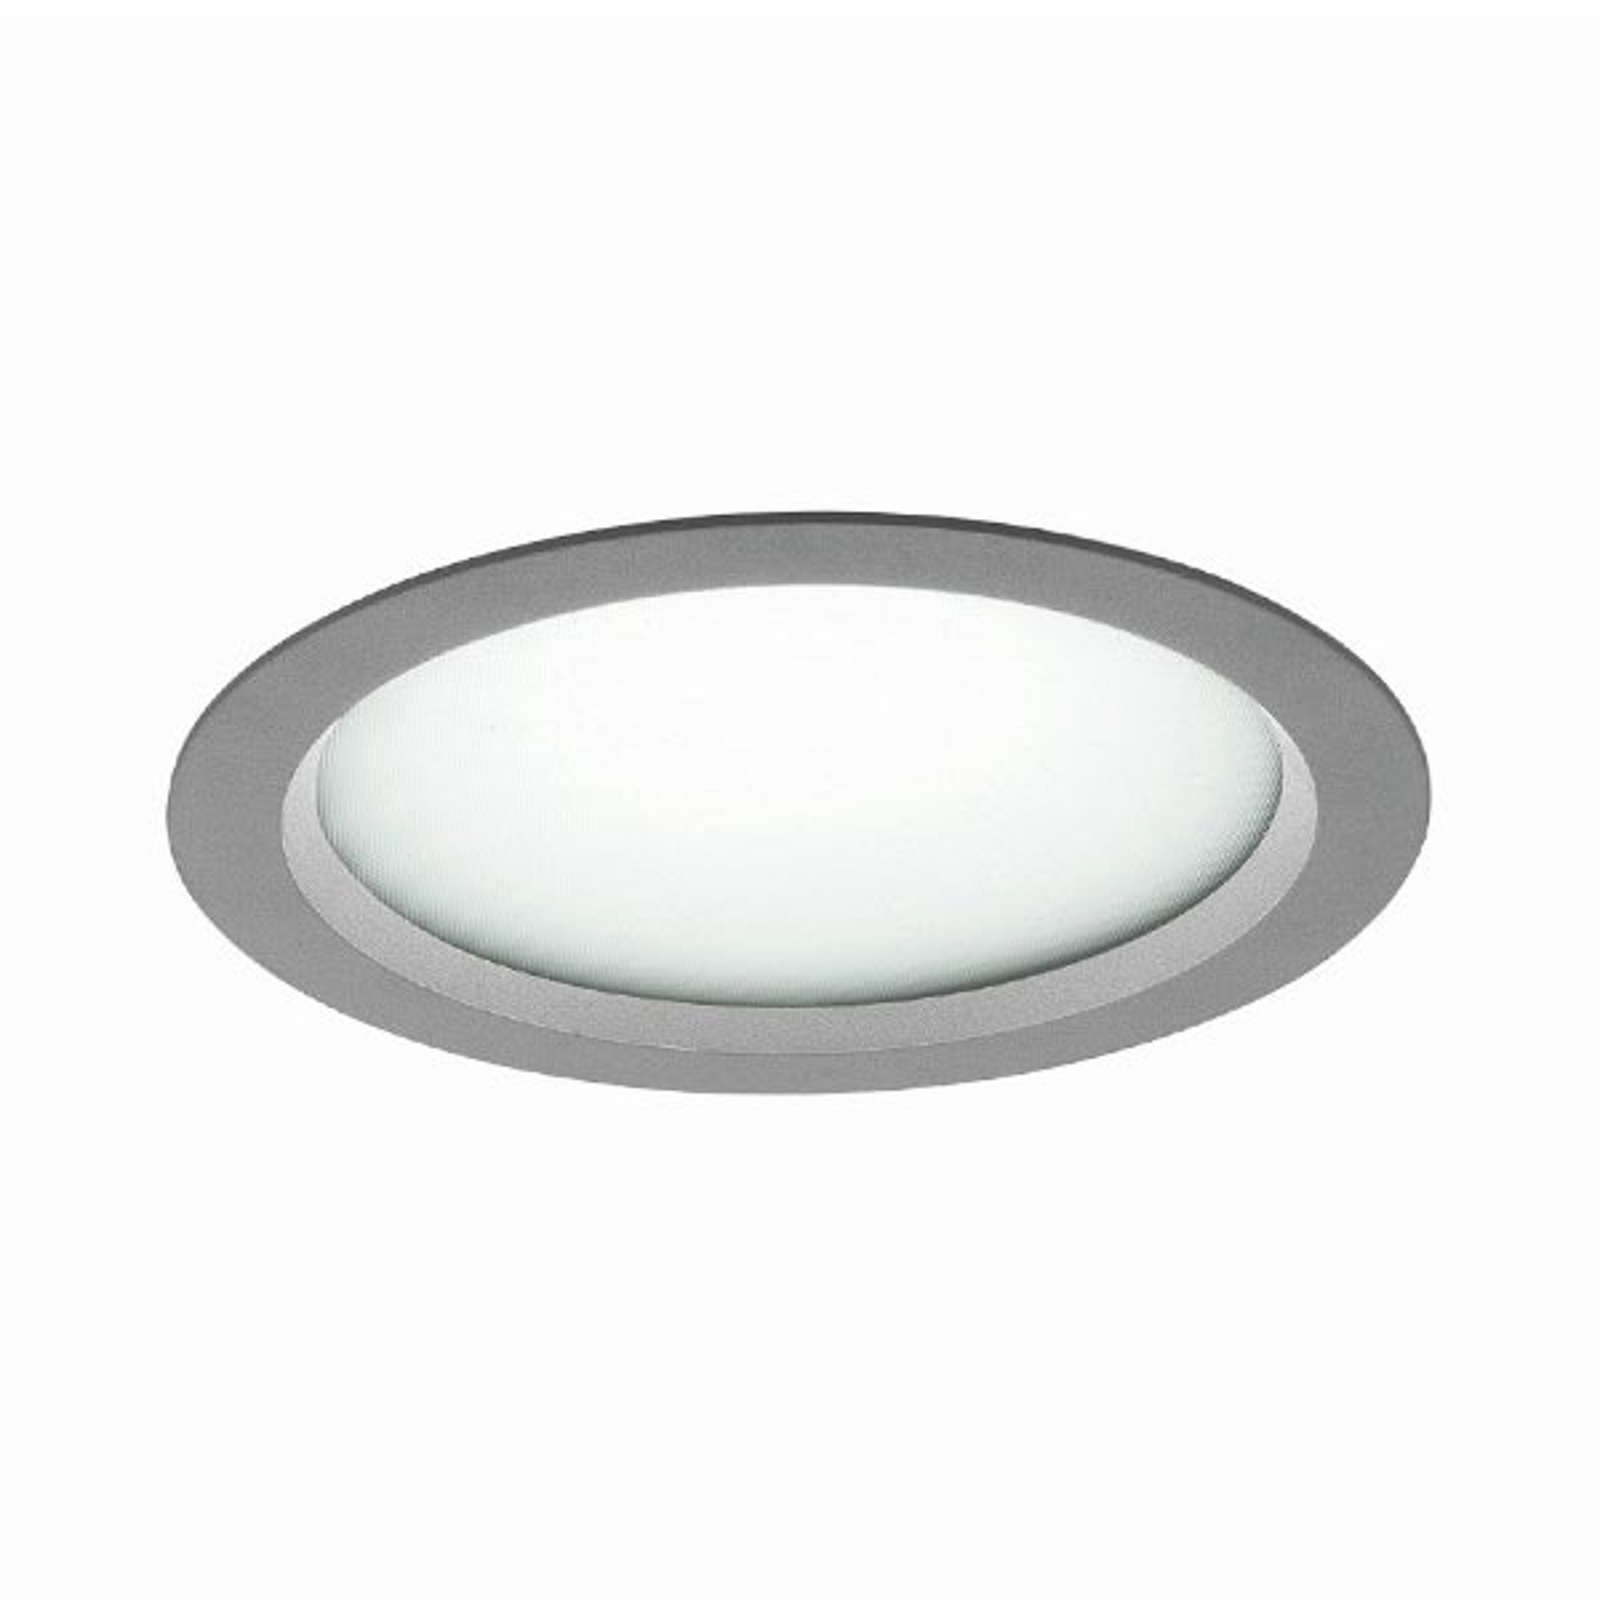 Mikroprismen-LED-Einbauleuchte Vale-Tu Flat Large